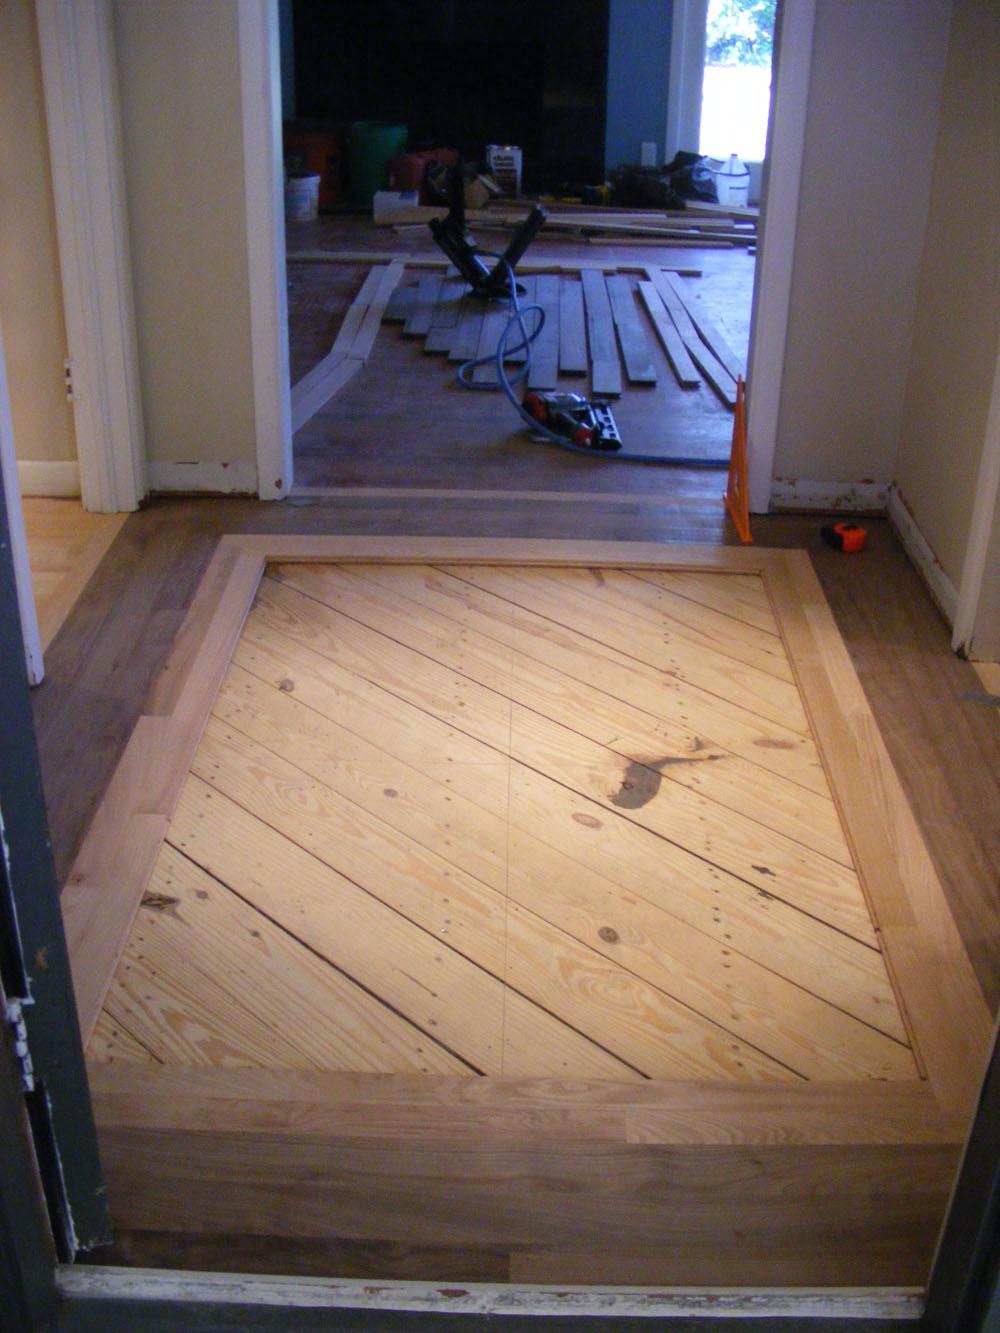 De lago grundl hardwood floors custom american walnut and for 13 floor dallas tx